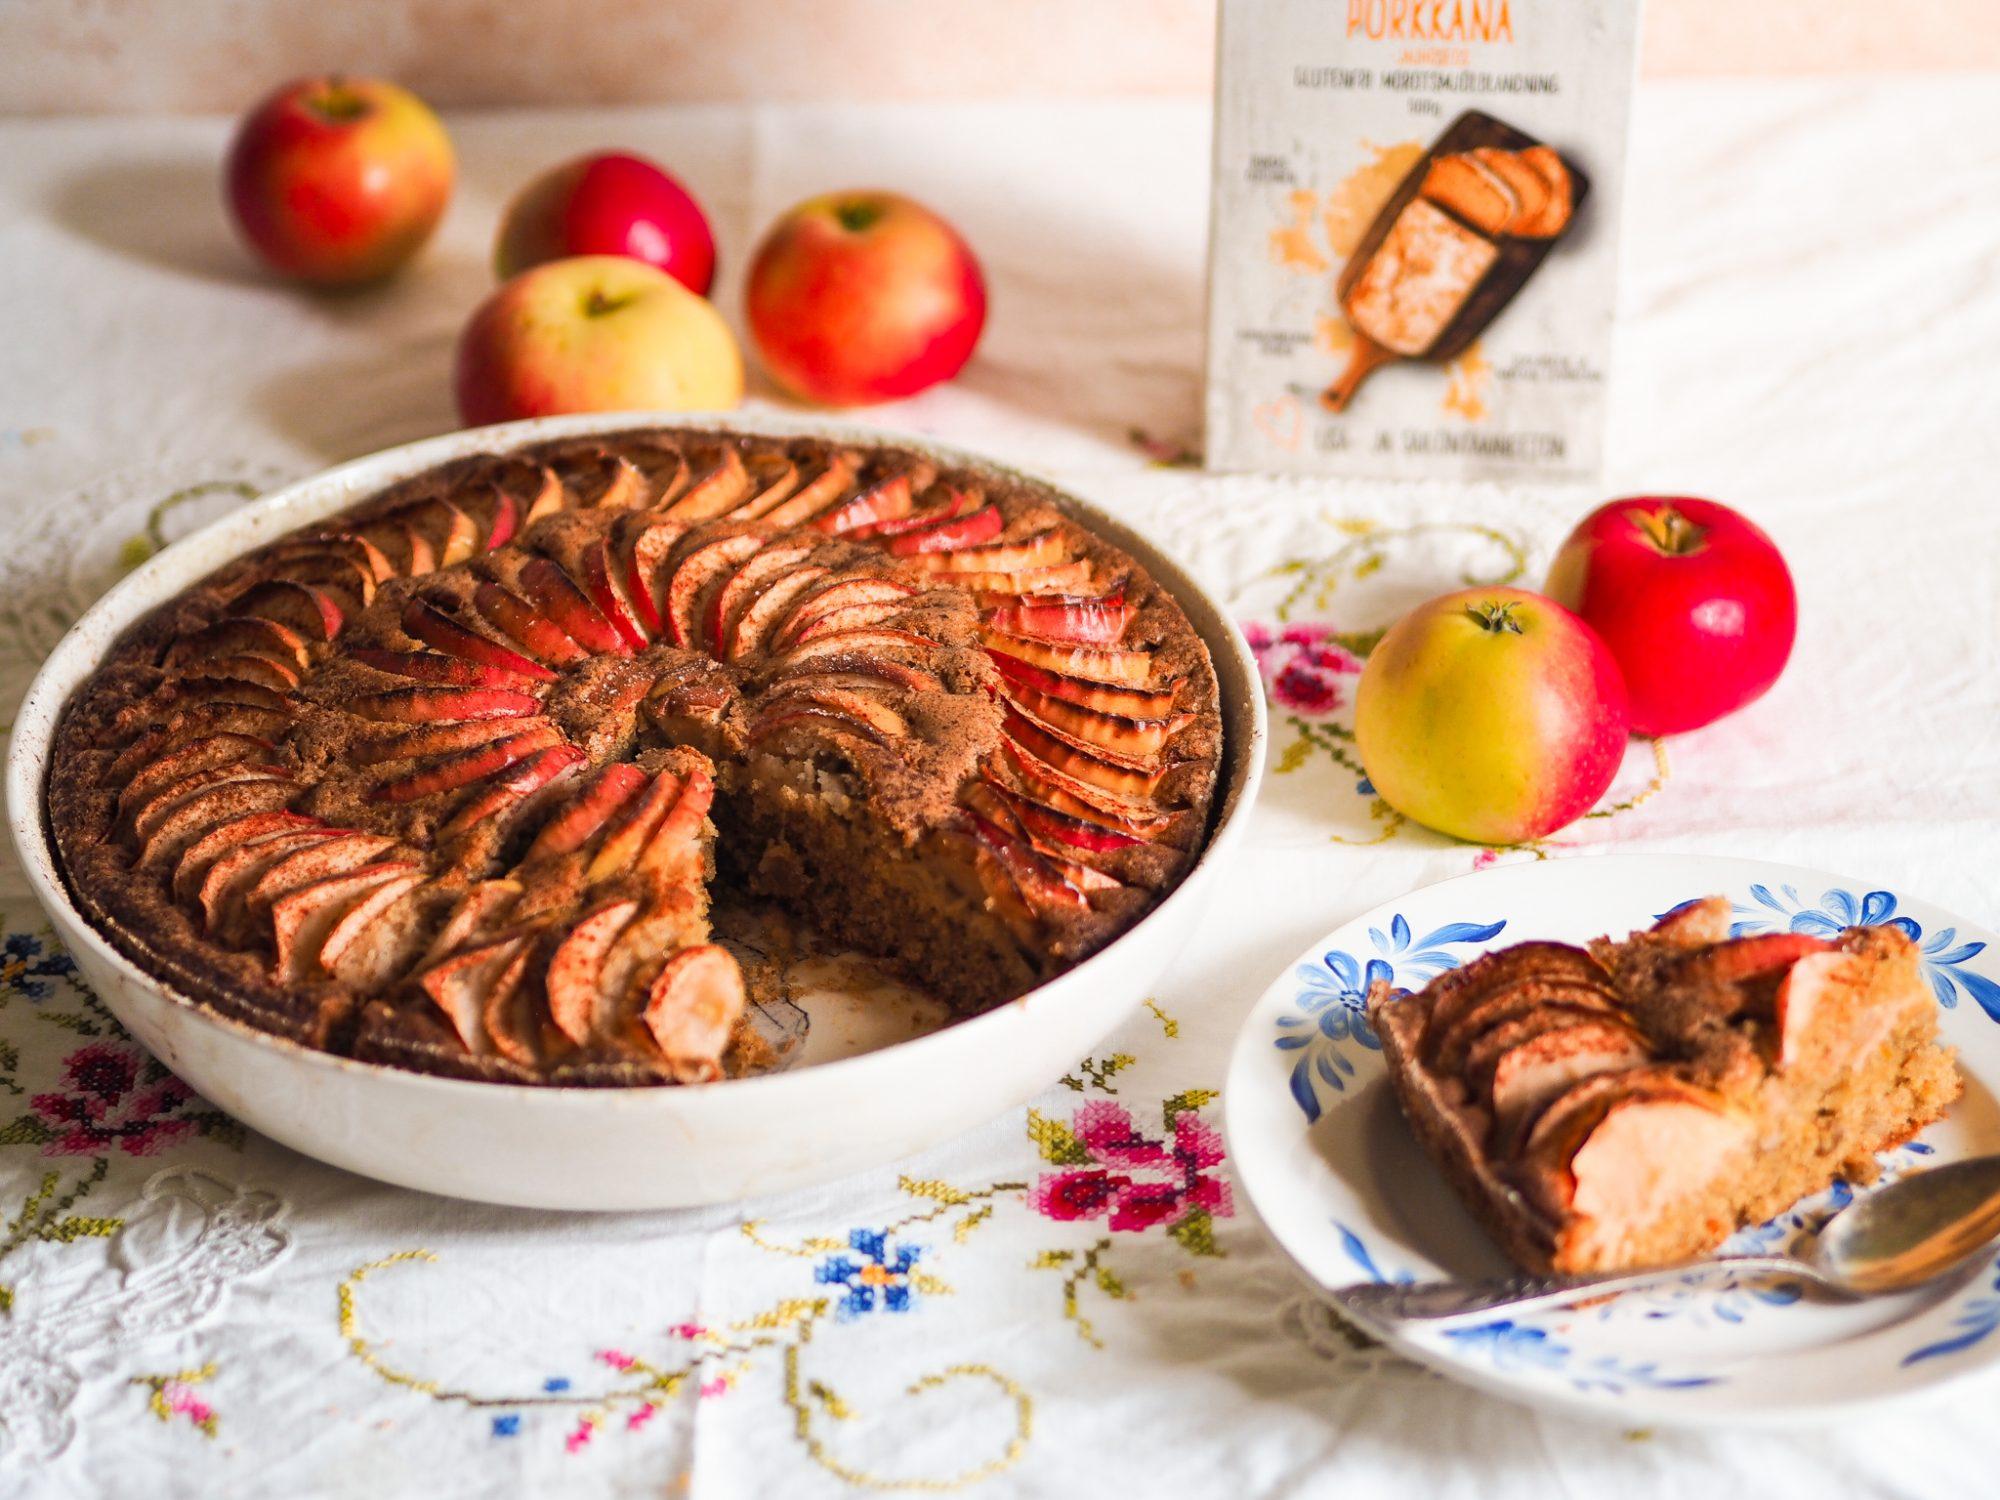 Gluten-free rustic apple pie